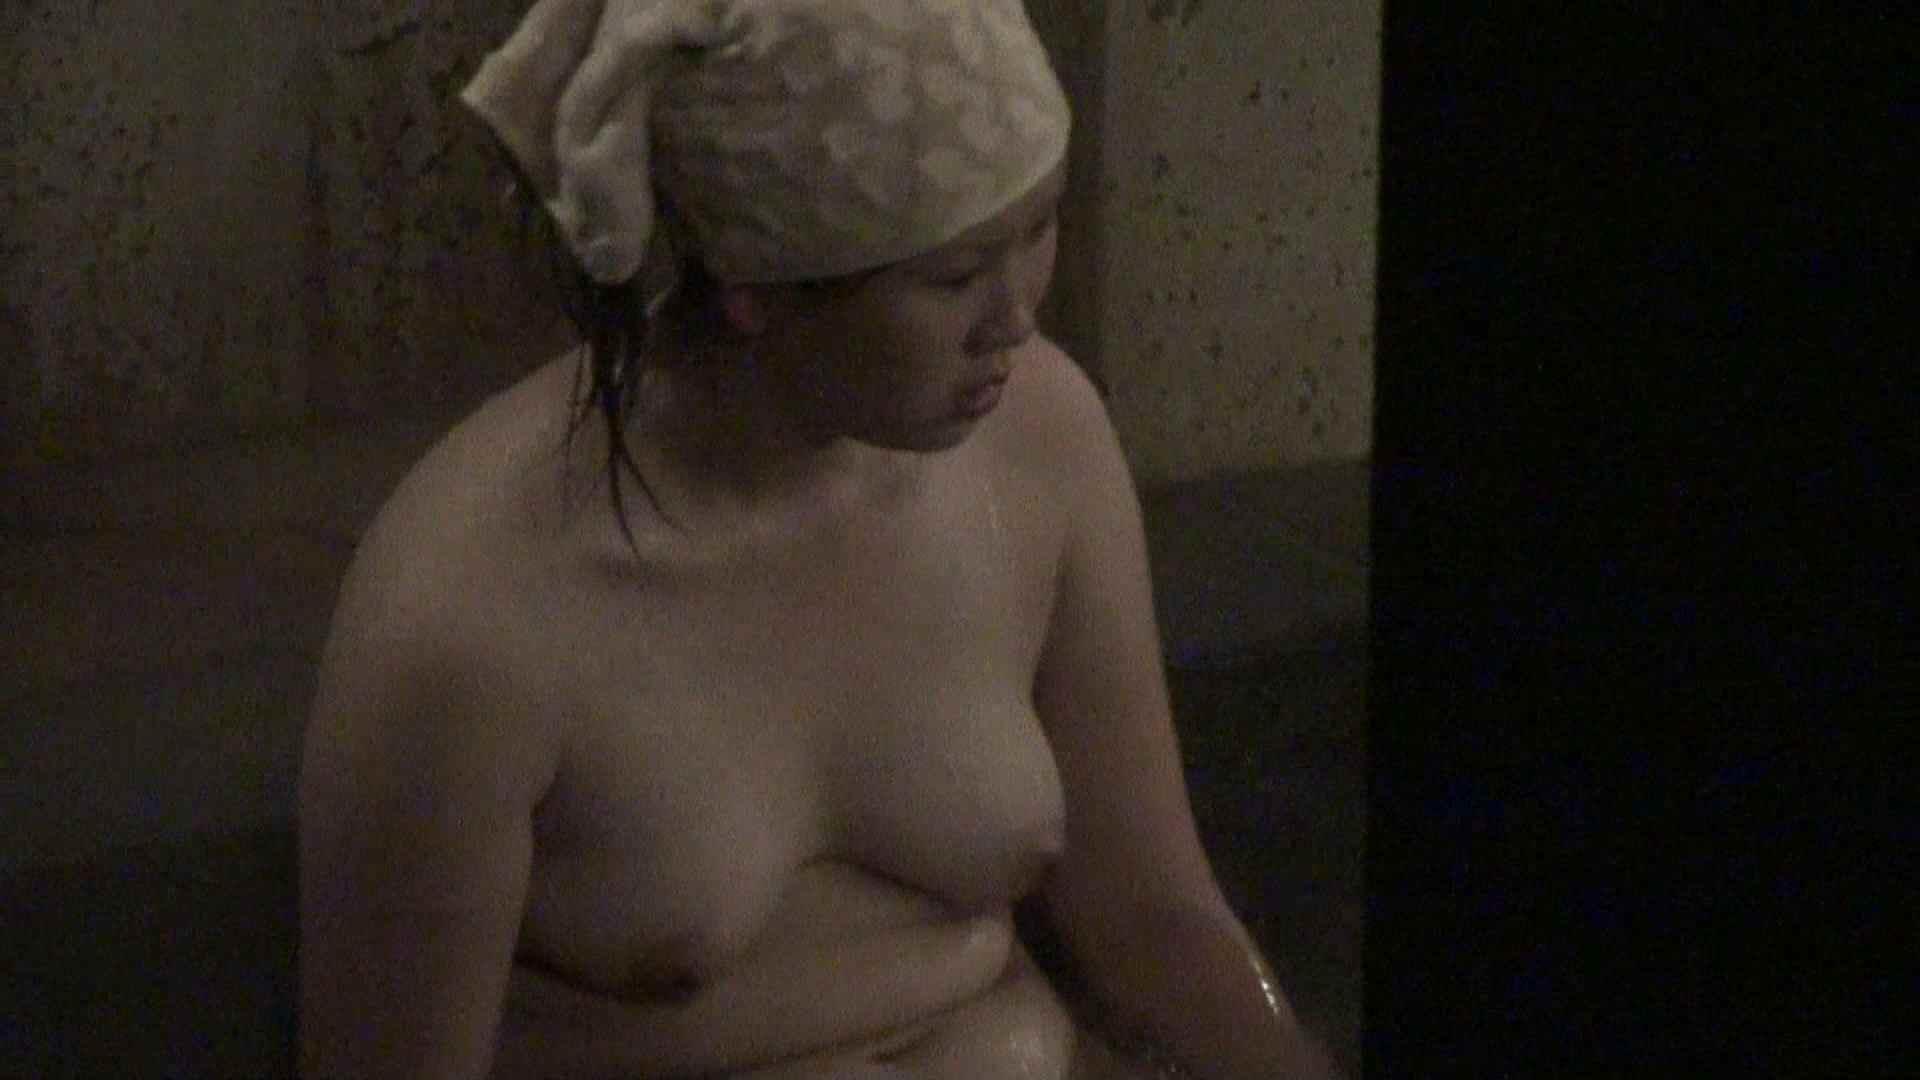 Aquaな露天風呂Vol.320 OL女体 | 露天  43連発 19